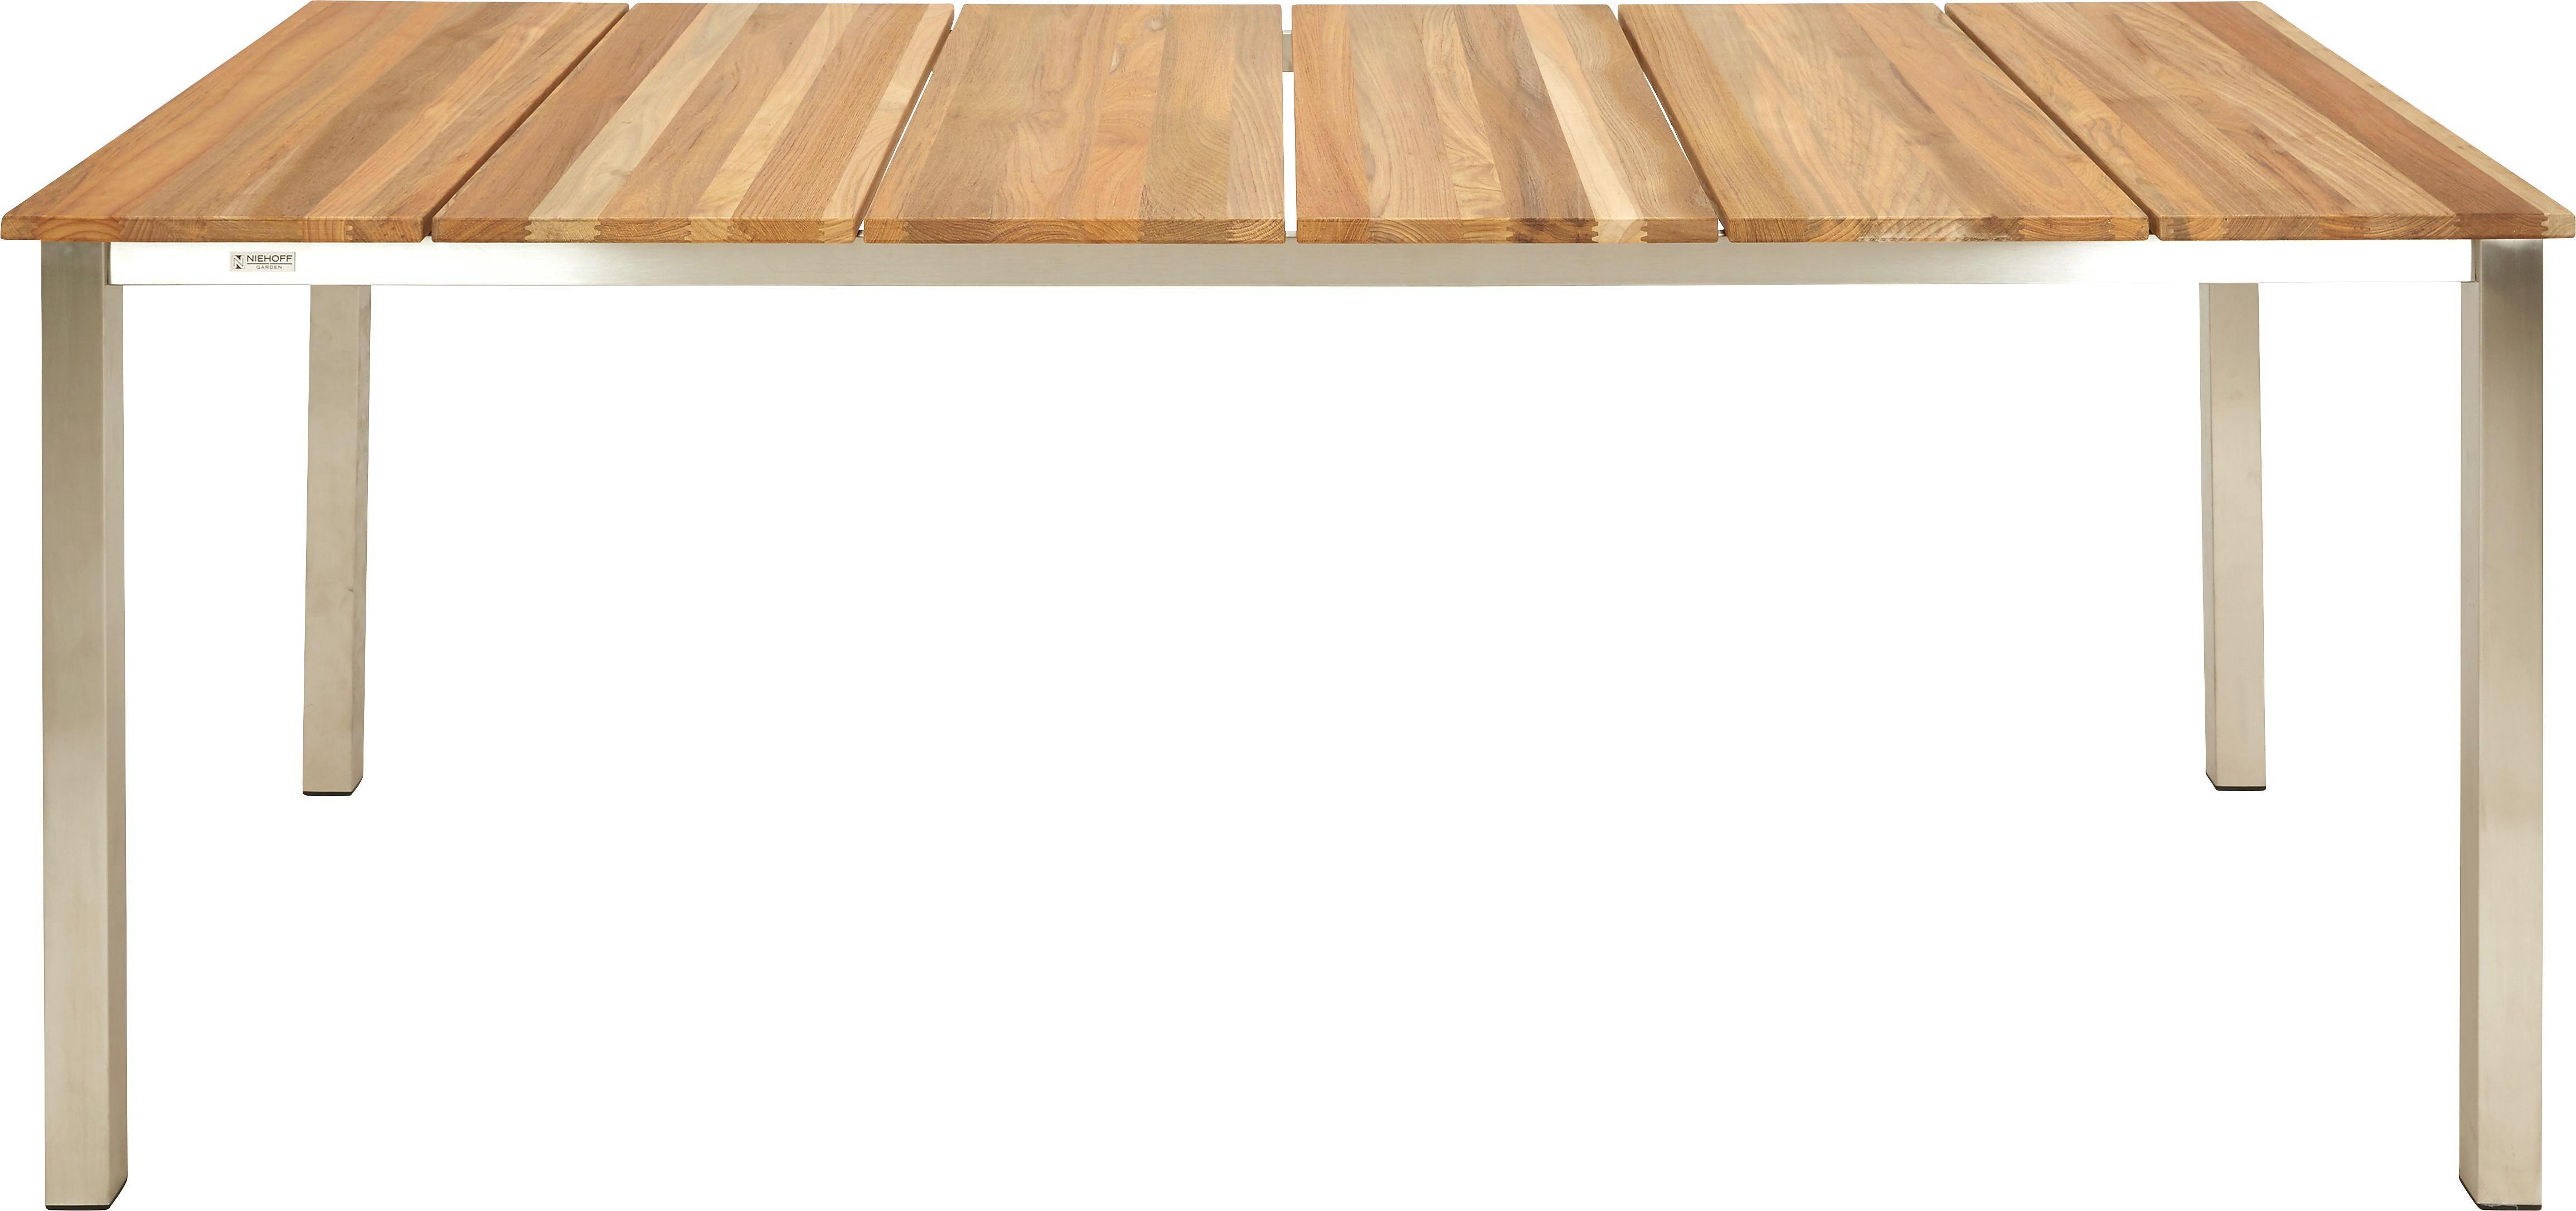 GARTENTISCH Holz Teakfarben - Edelstahlfarben/Teakfarben, Design, Holz/Metall (95/76/200cm)